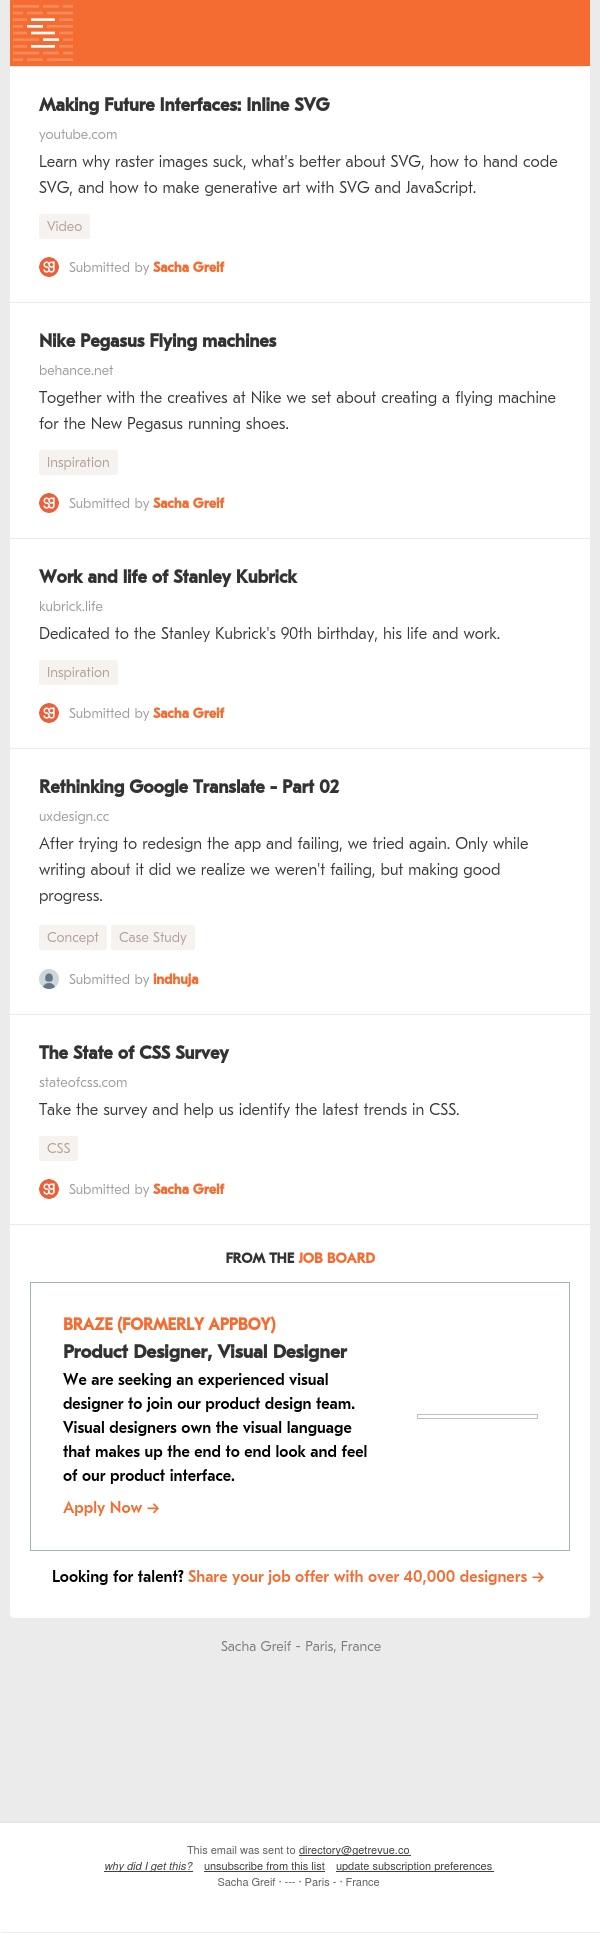 Inline SVG, Nike Pegasus, Stanley Kubrick, Google Translate, State of CSS